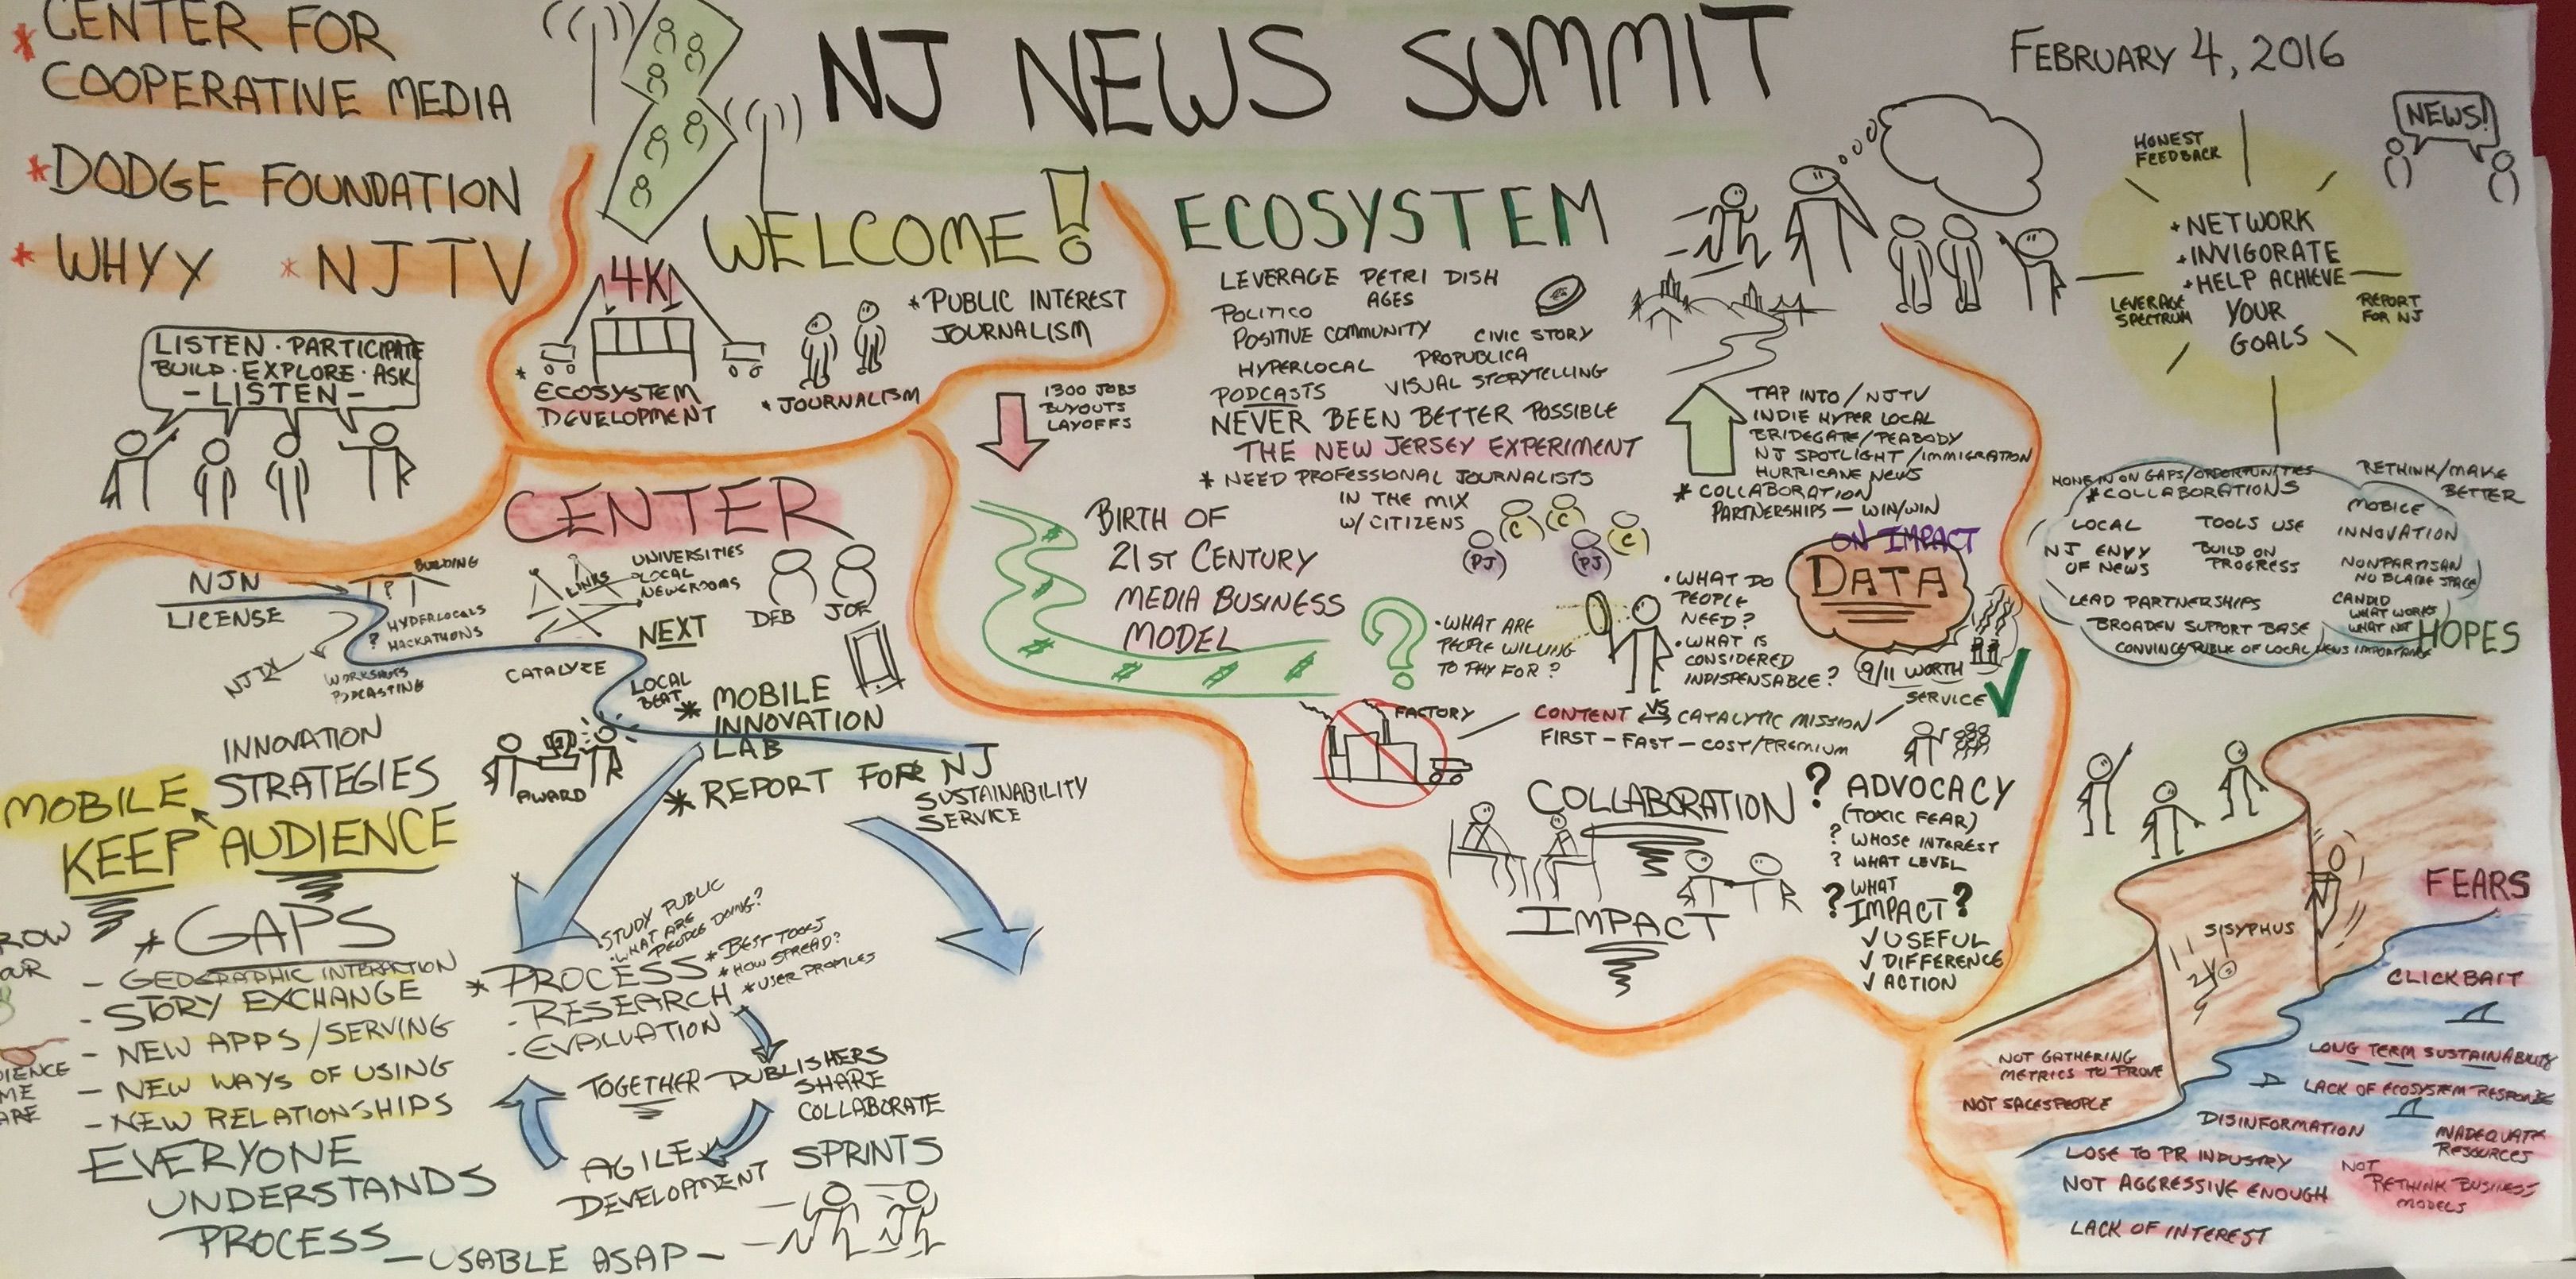 NJ News Summit, Montclair State University